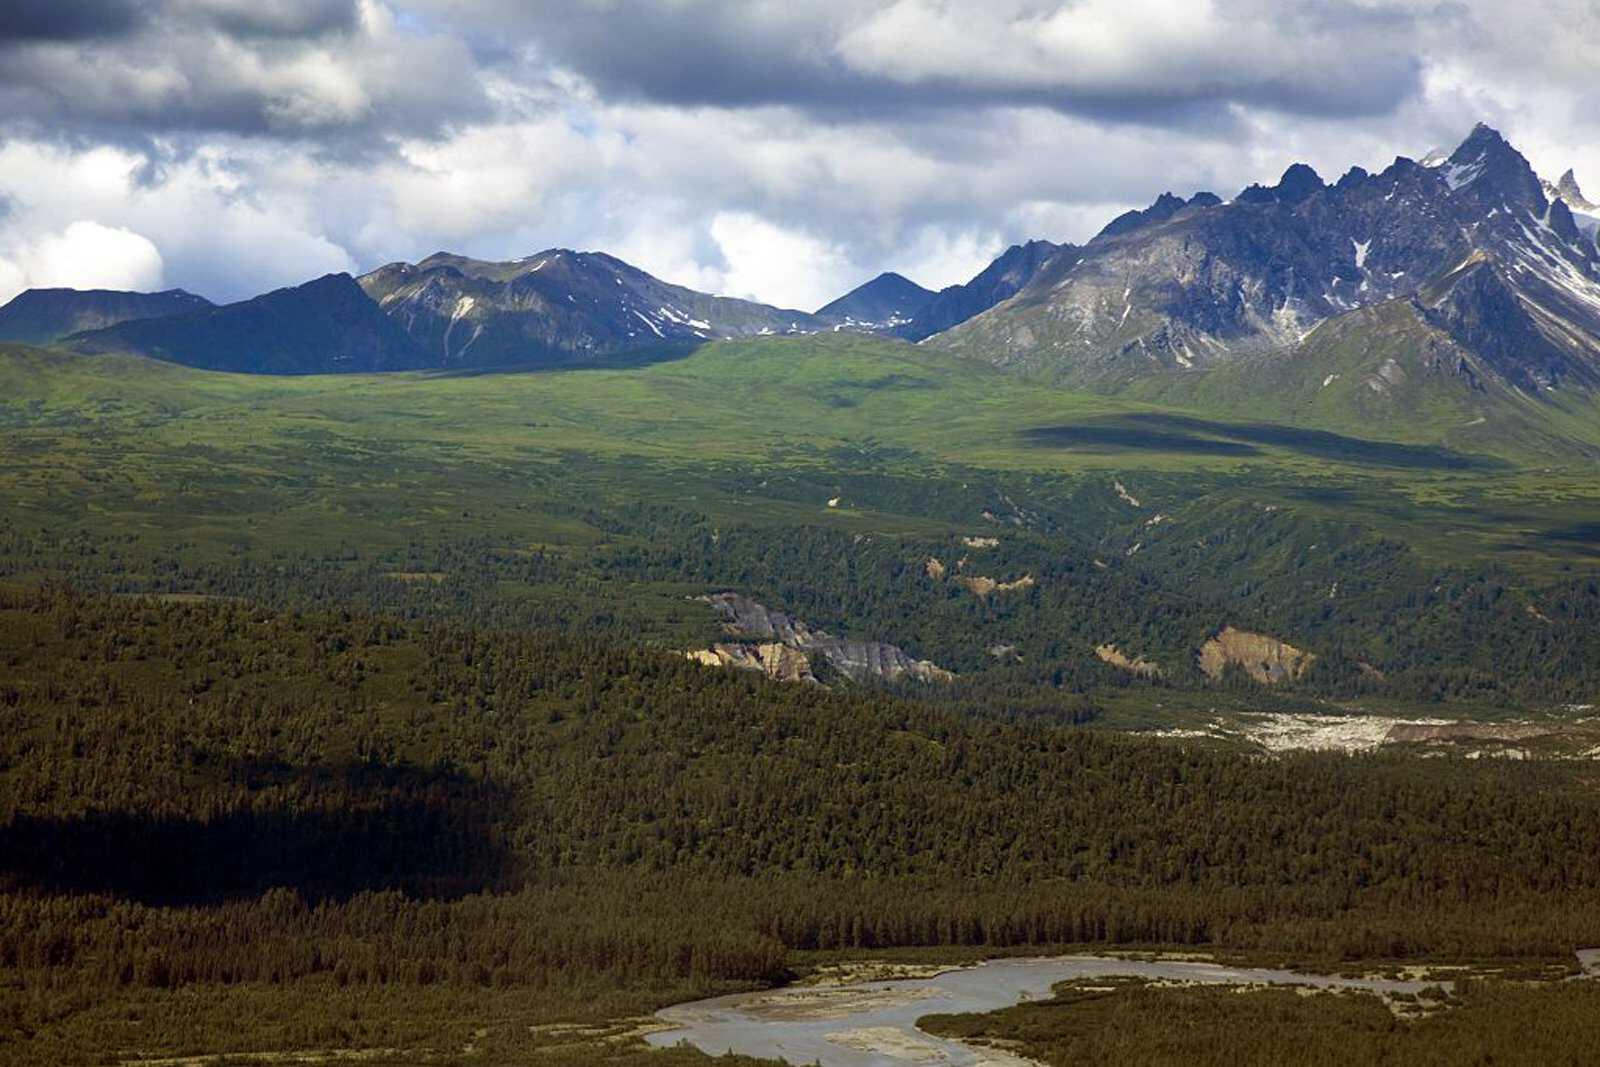 Pipeline-Alaska-Profits-Remote-glacial-river-and-alpine-forest-amongst-mountains.-Denali-National-Park,-Alaska-2008-LOC.jpg